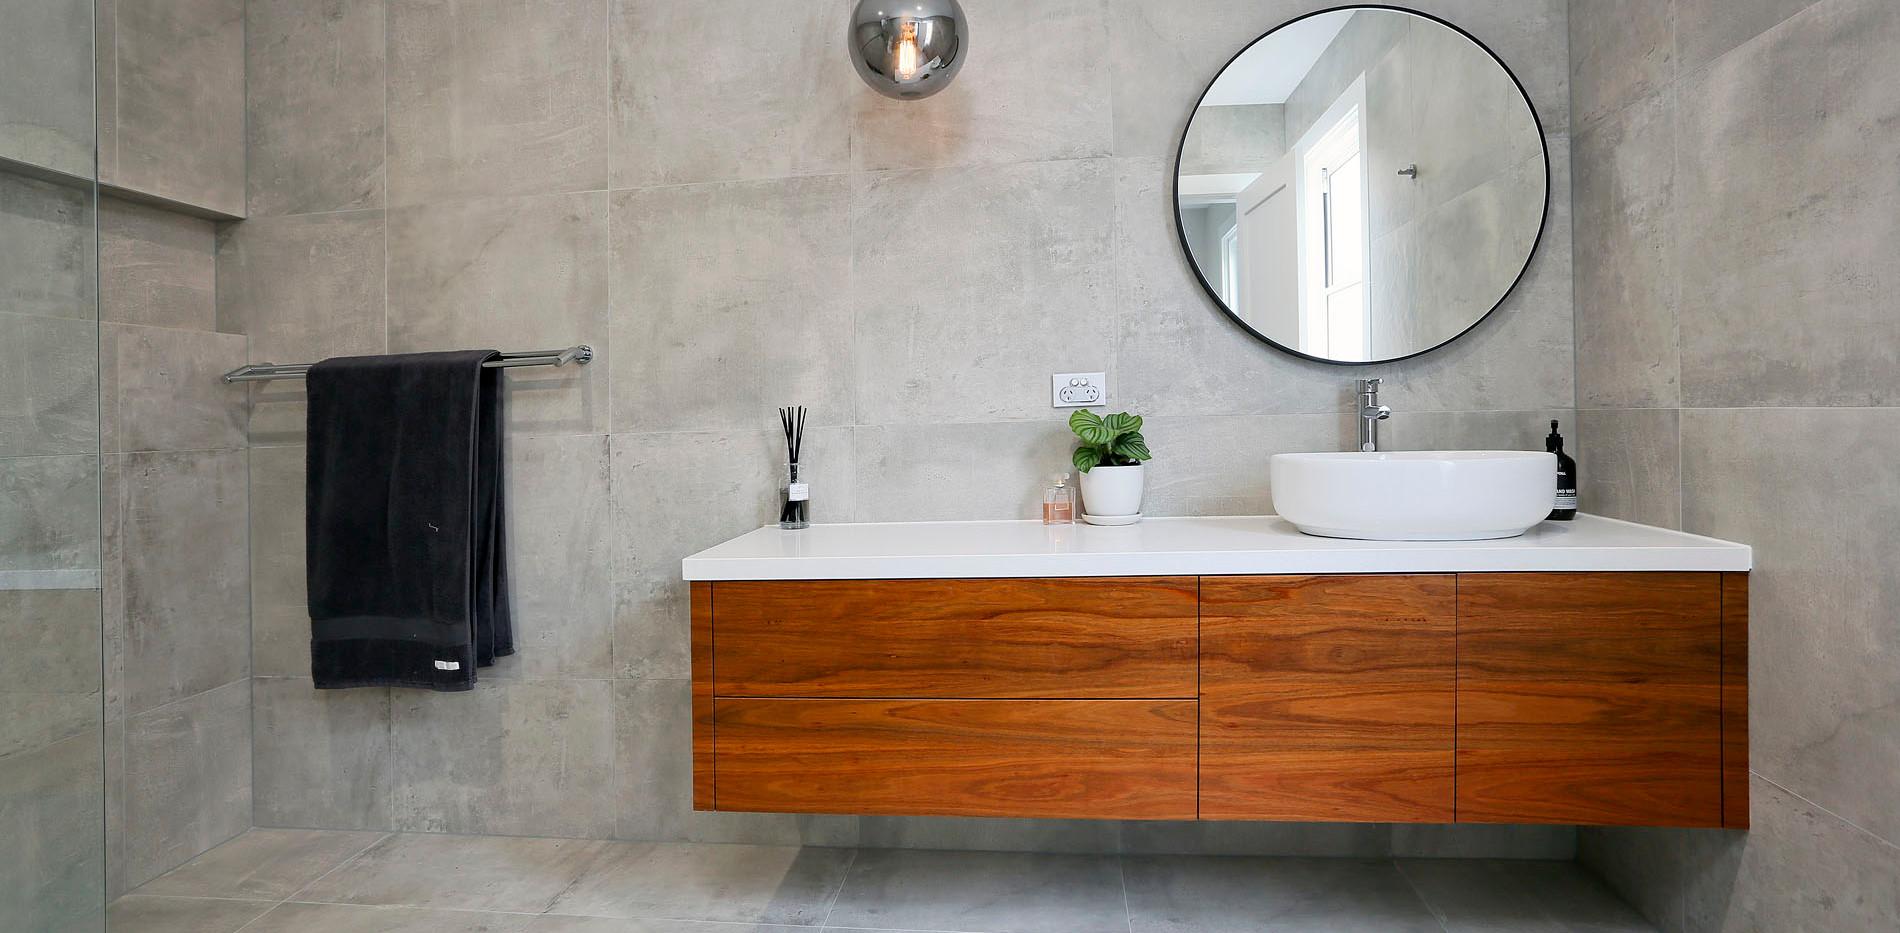 Hawkesbury bathrooms and Kitchens (18)